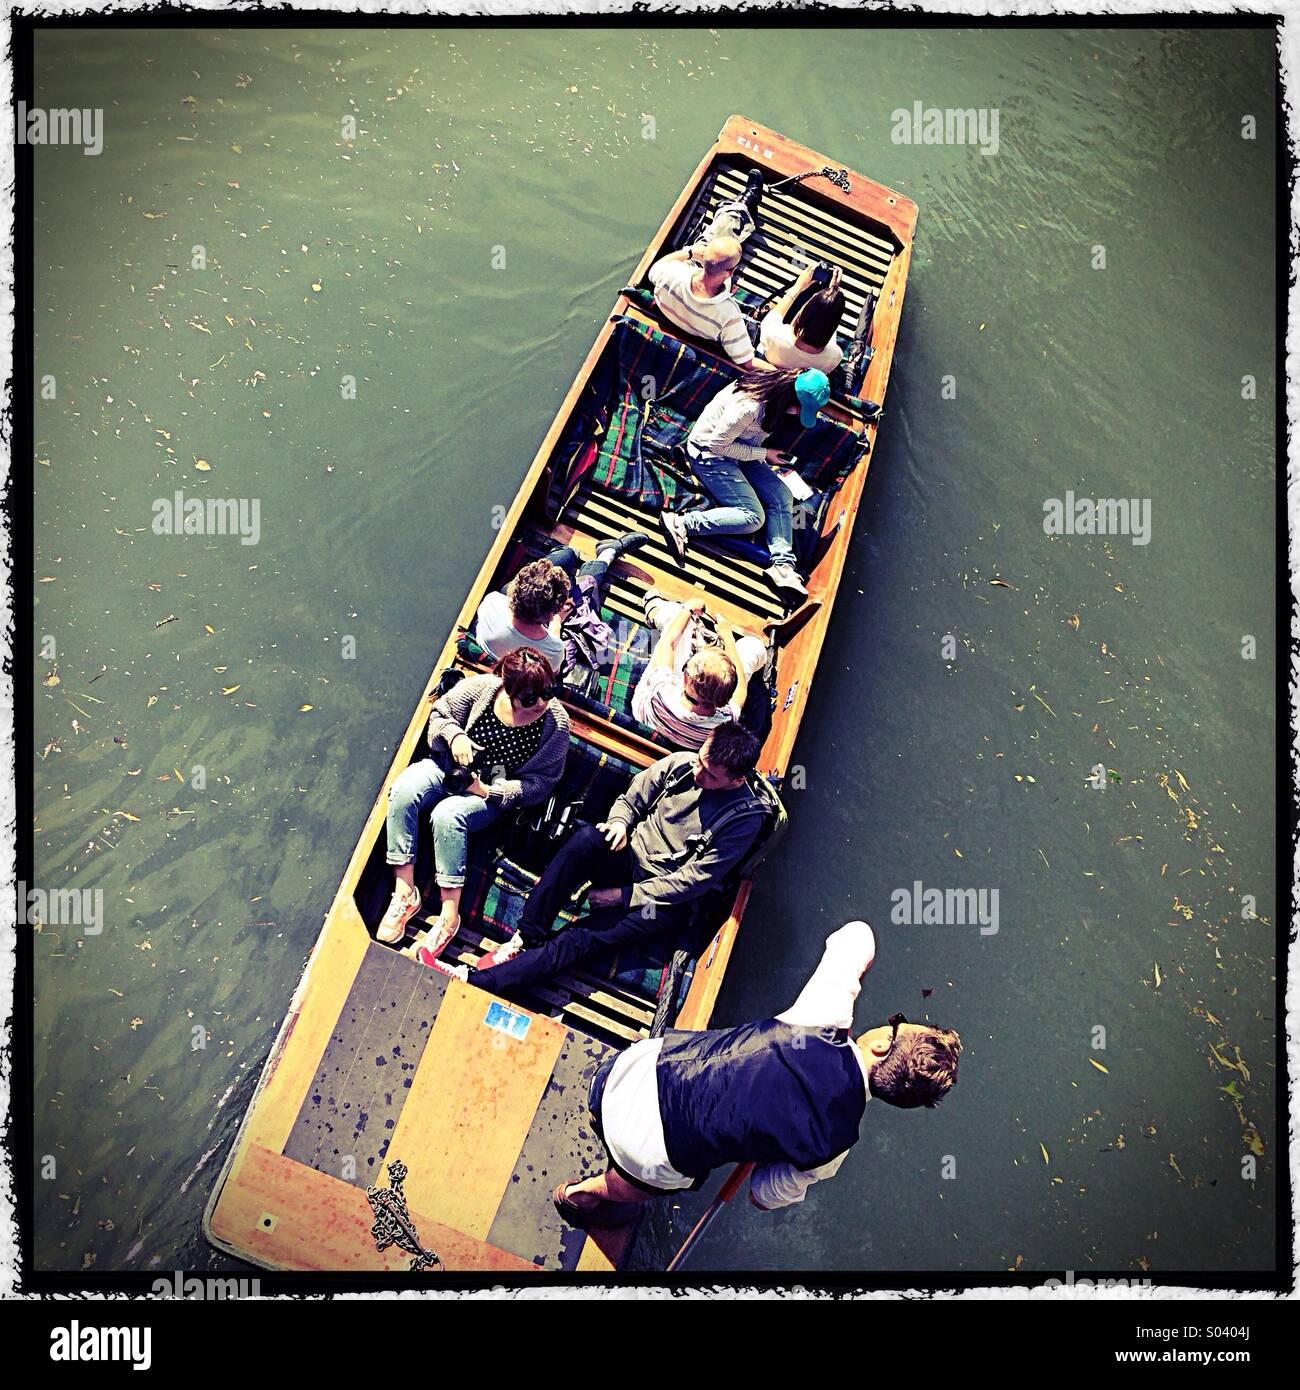 Cambridge punting - Stock Image